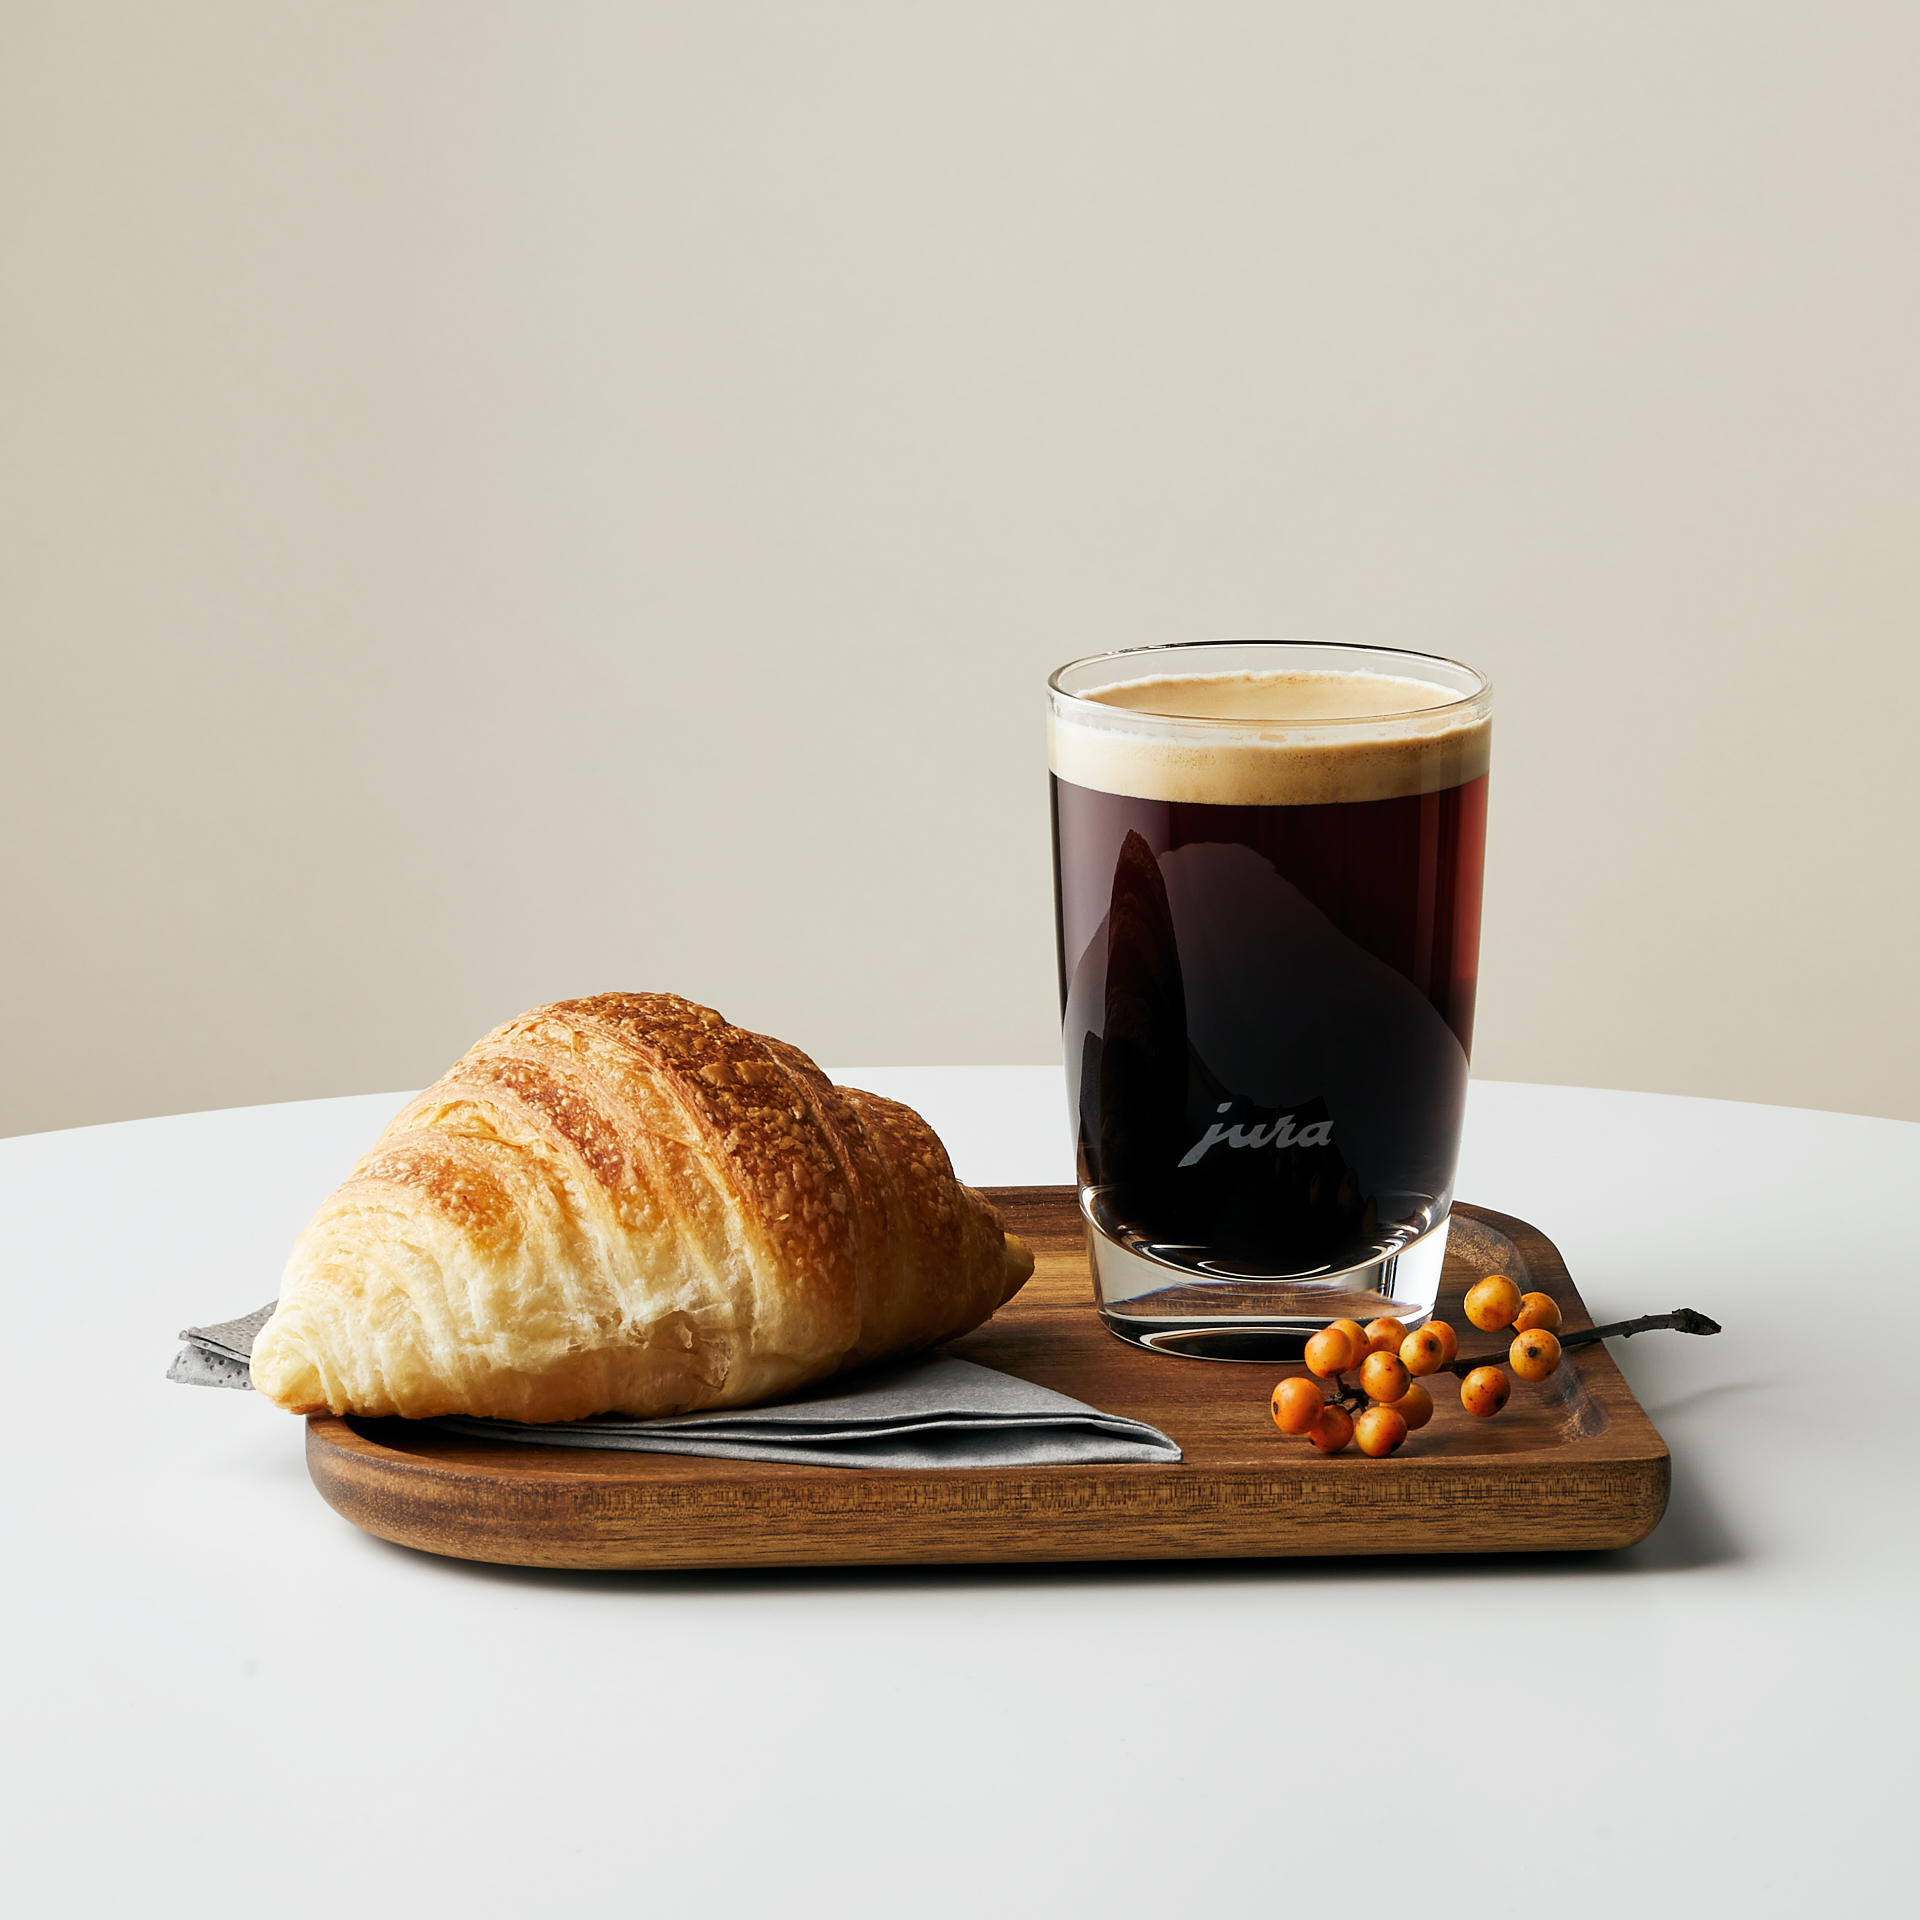 SP_Jura_Cafe_Creme_Croissant.jpg